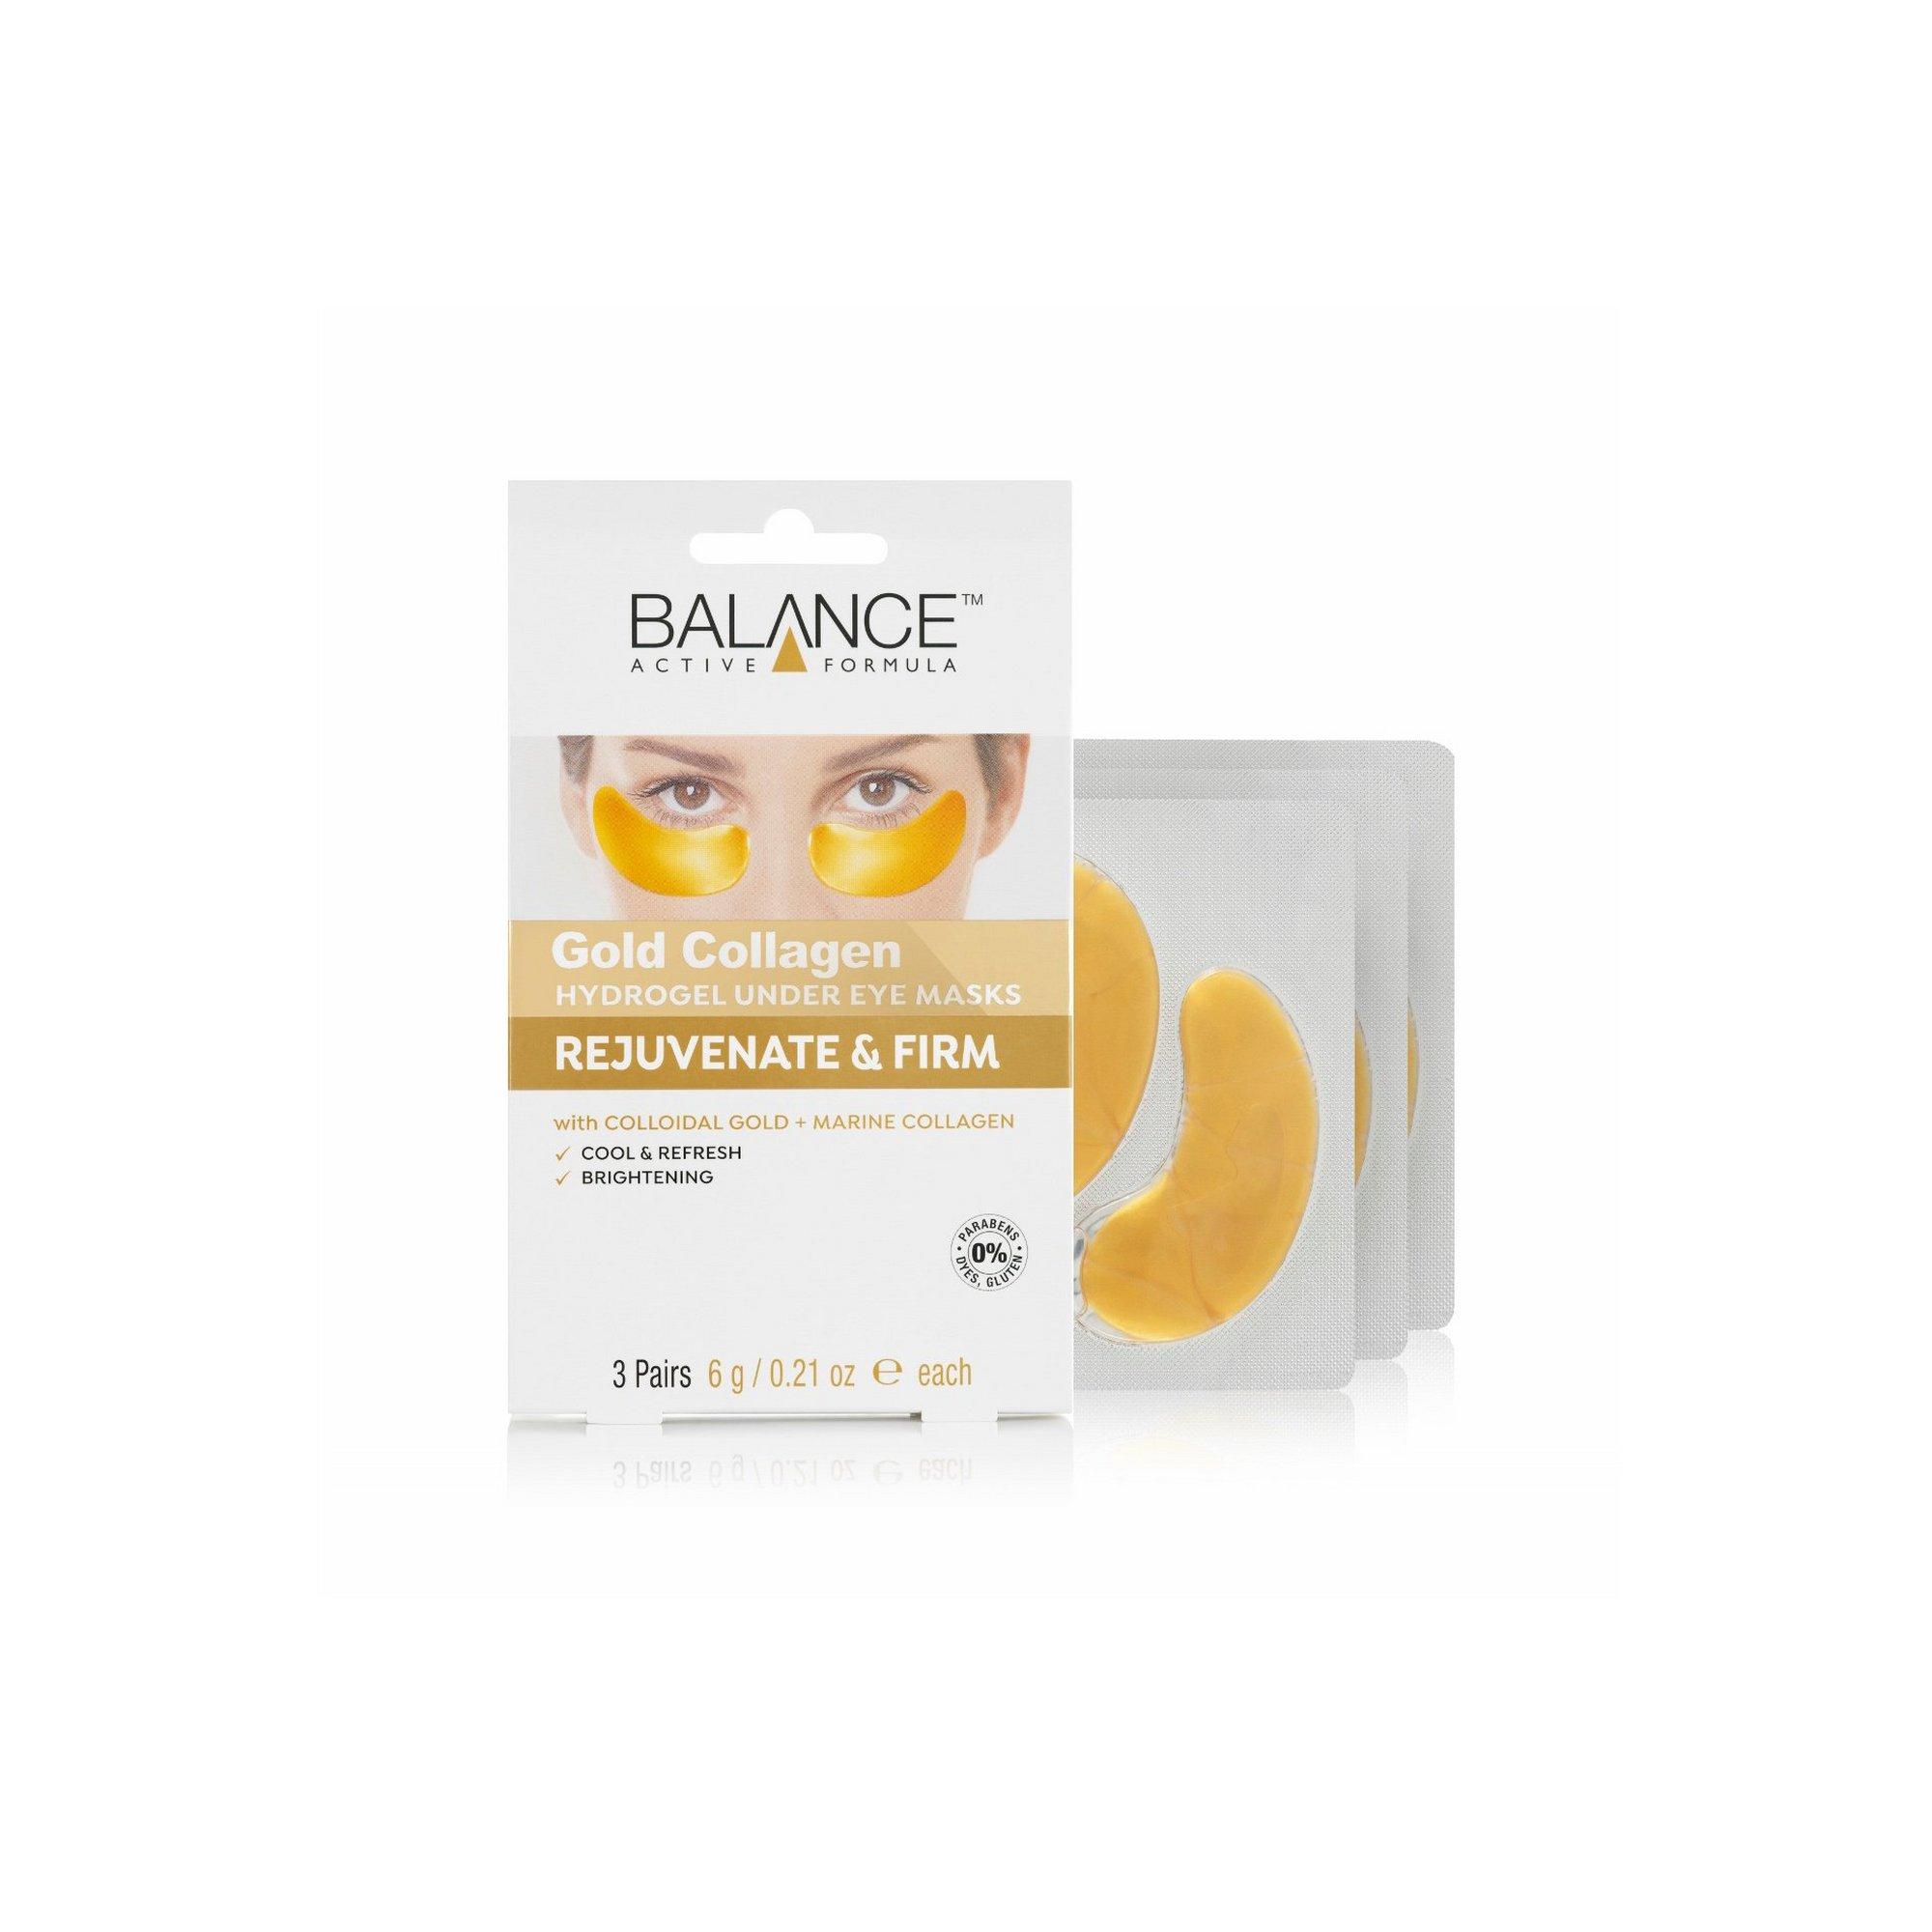 Image of Balance Pack of 3 Gold Collagen Hydro Gel Under Eye Masks